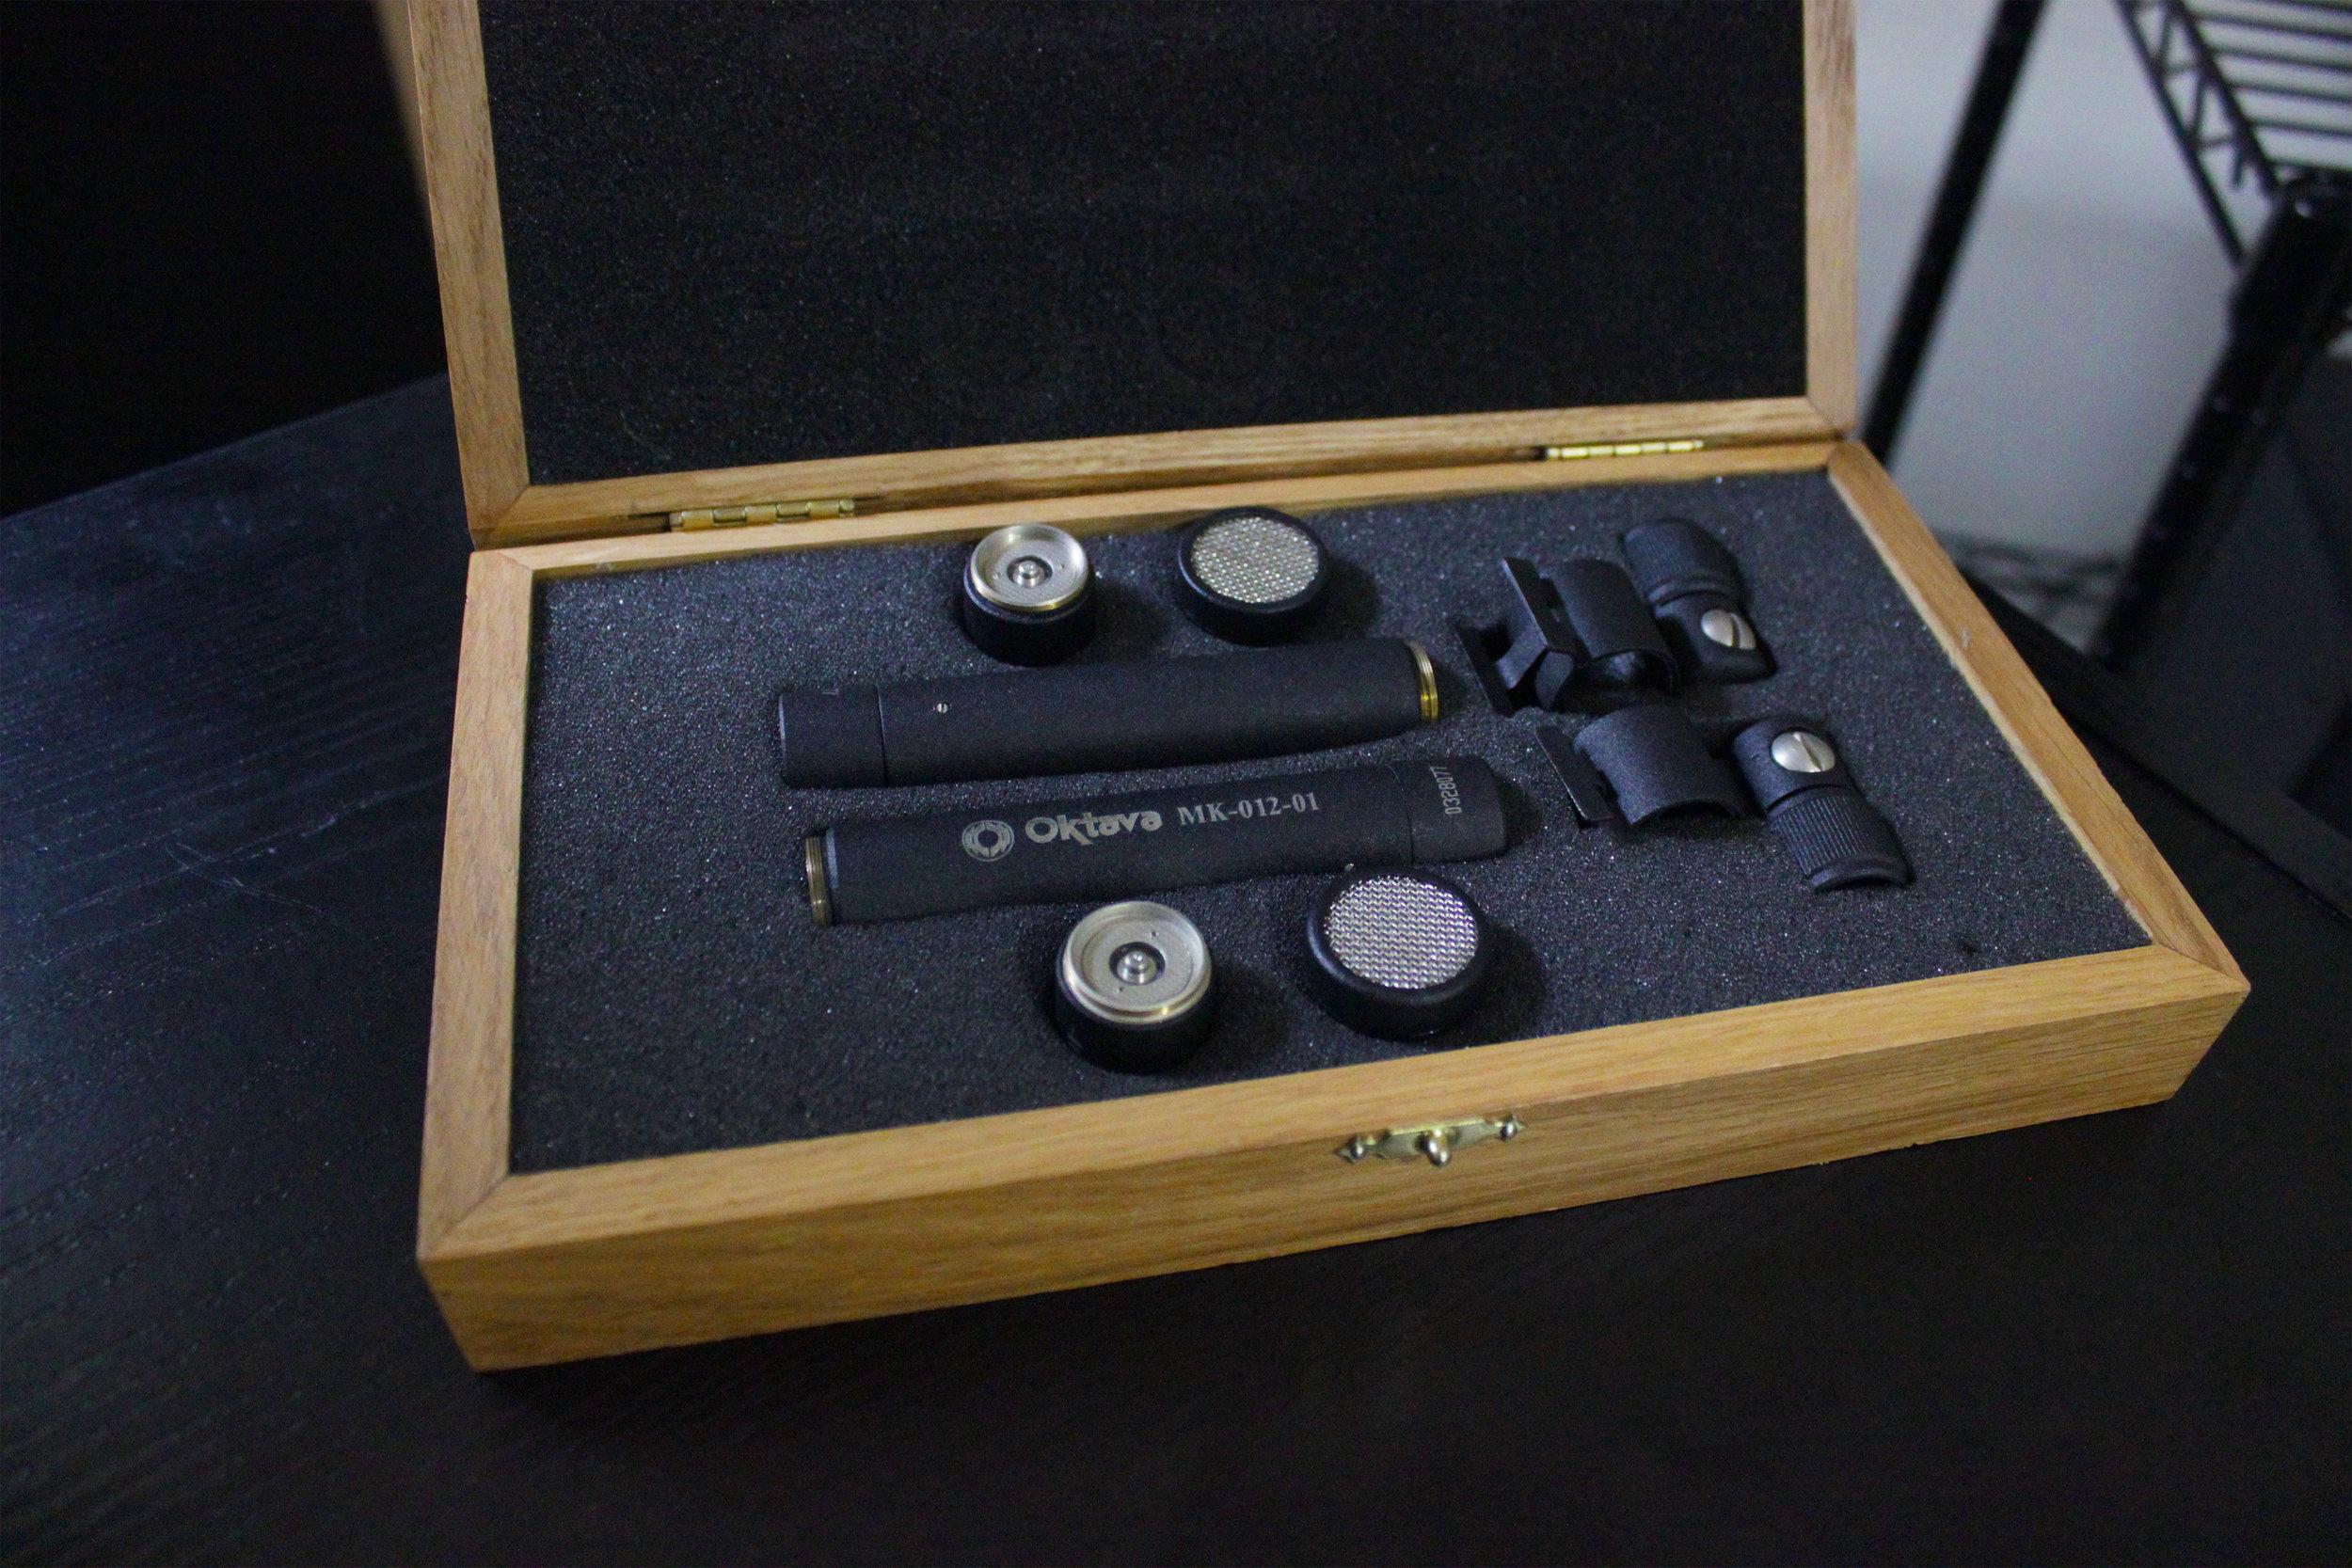 Oktava Mk 012 Microphones.jpg